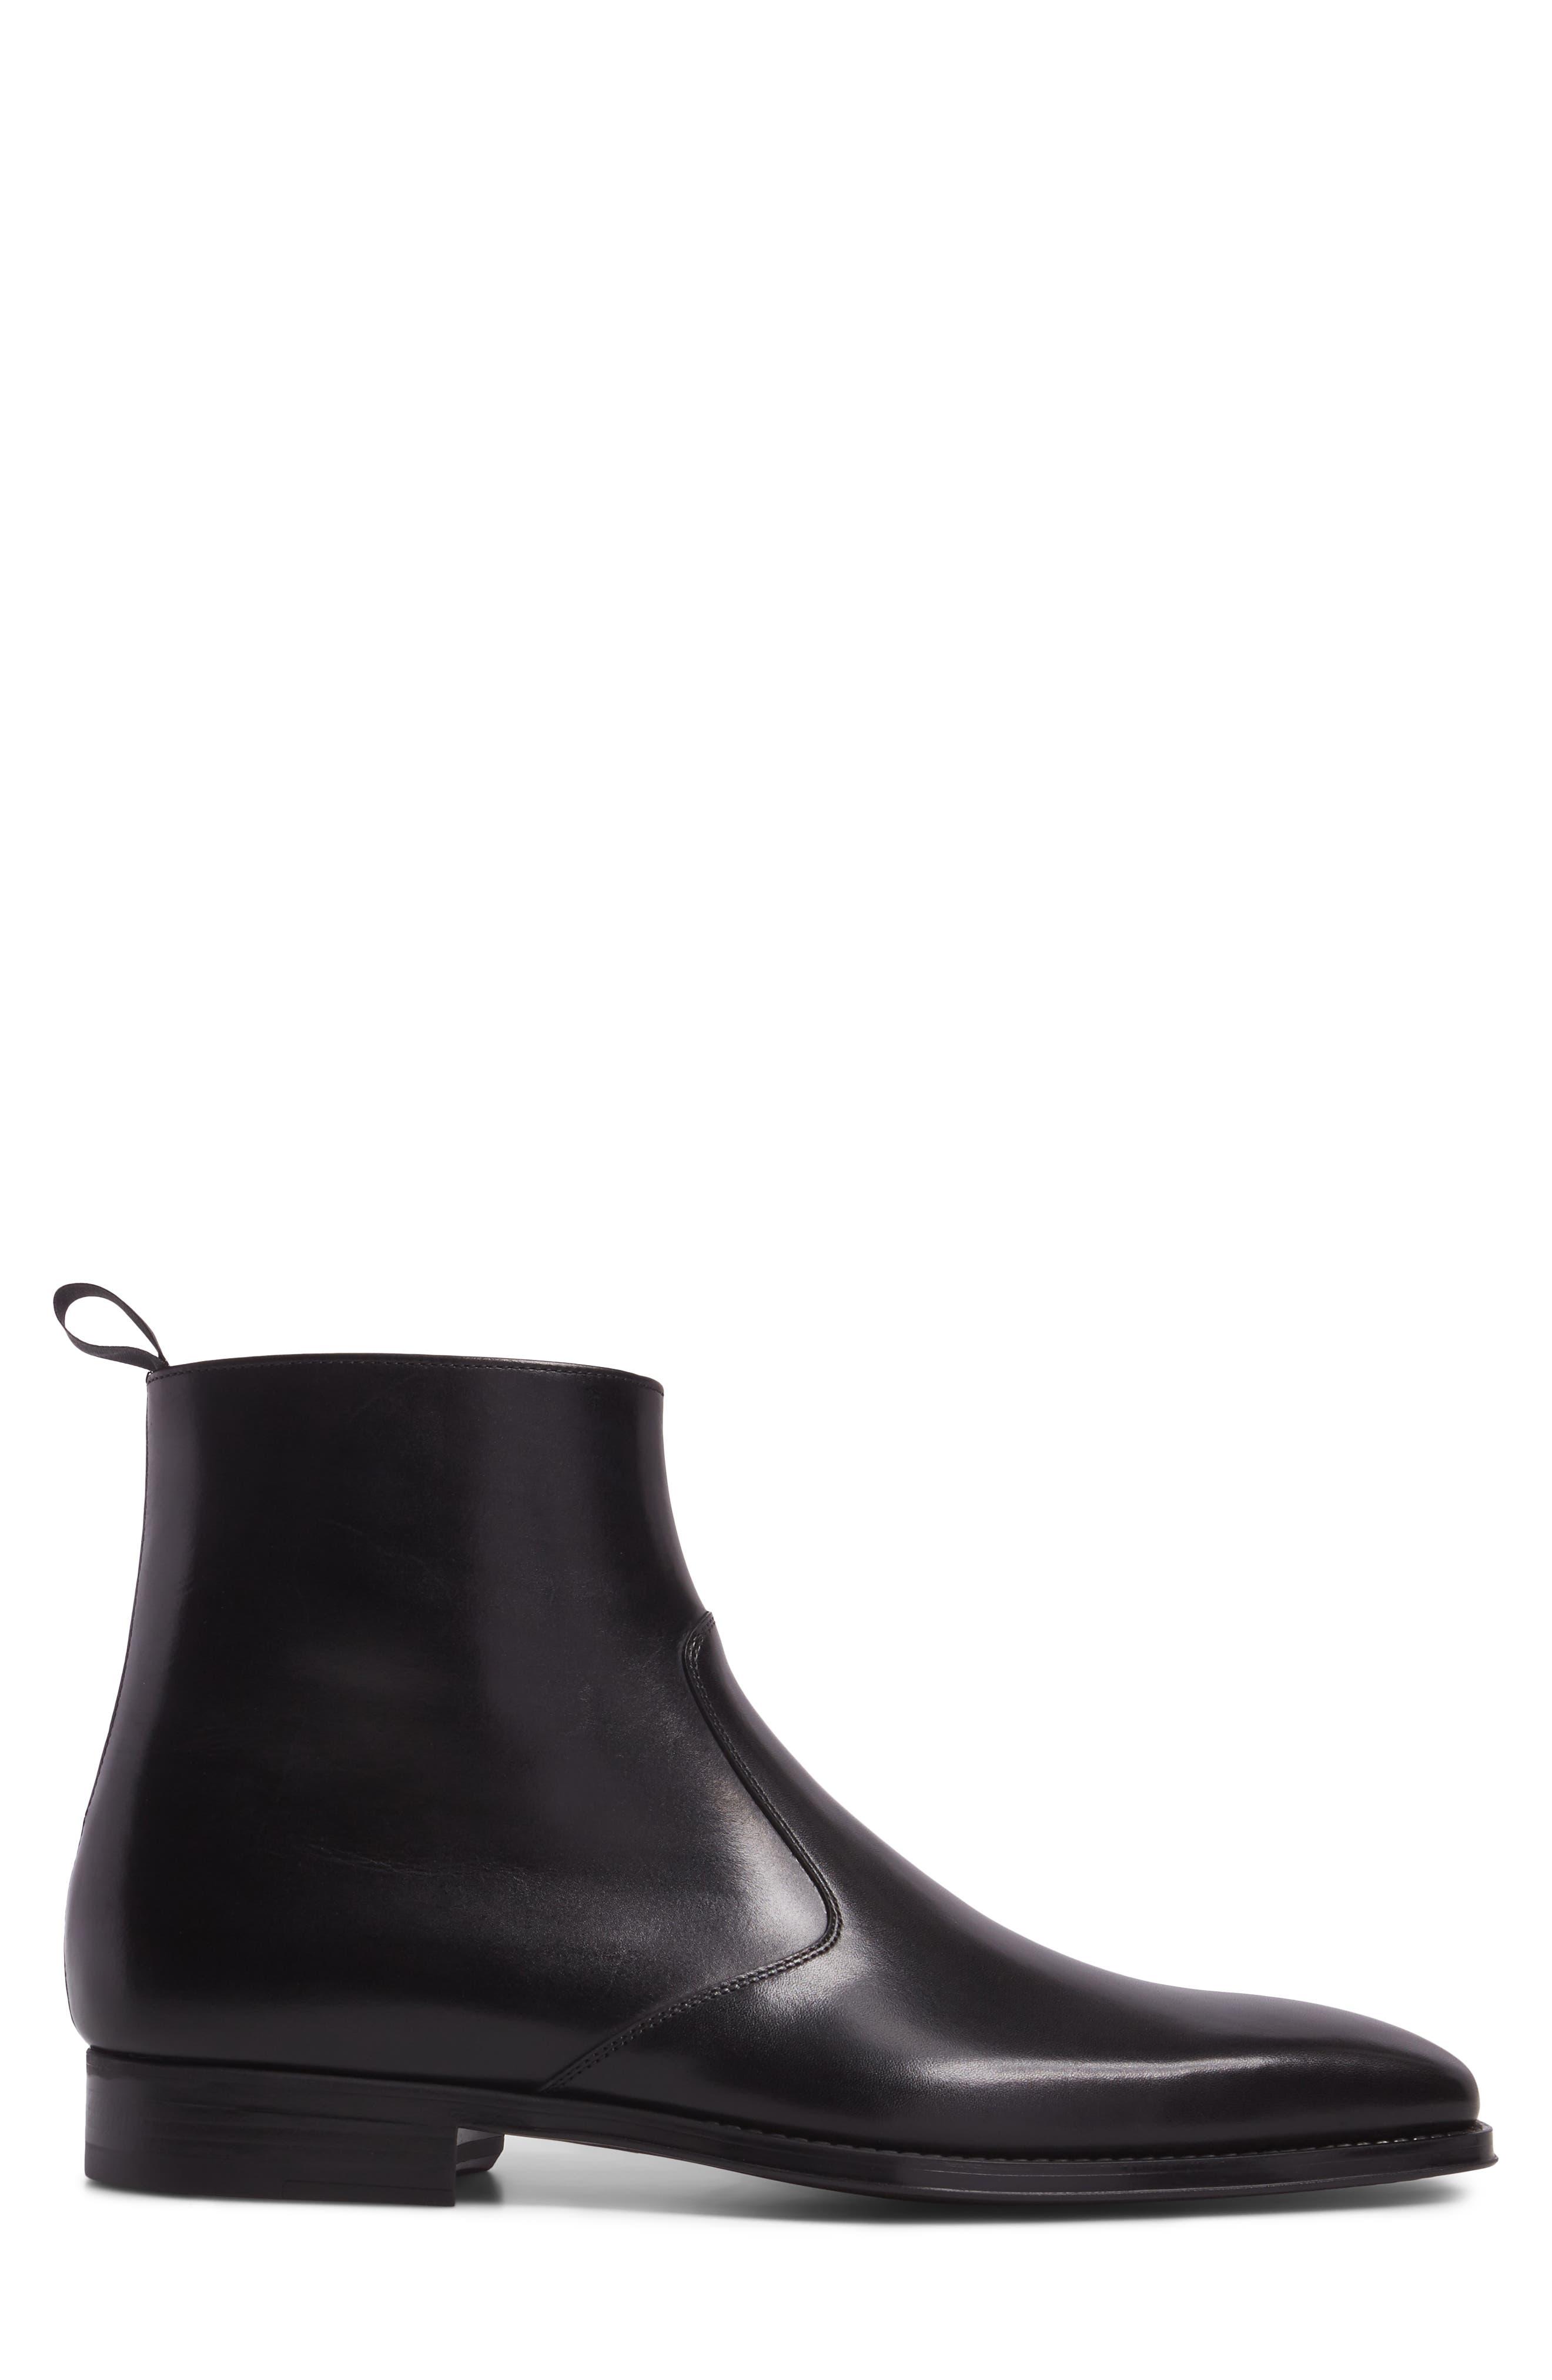 Rosdale Zip Boot,                             Alternate thumbnail 3, color,                             BLACK LEATHER